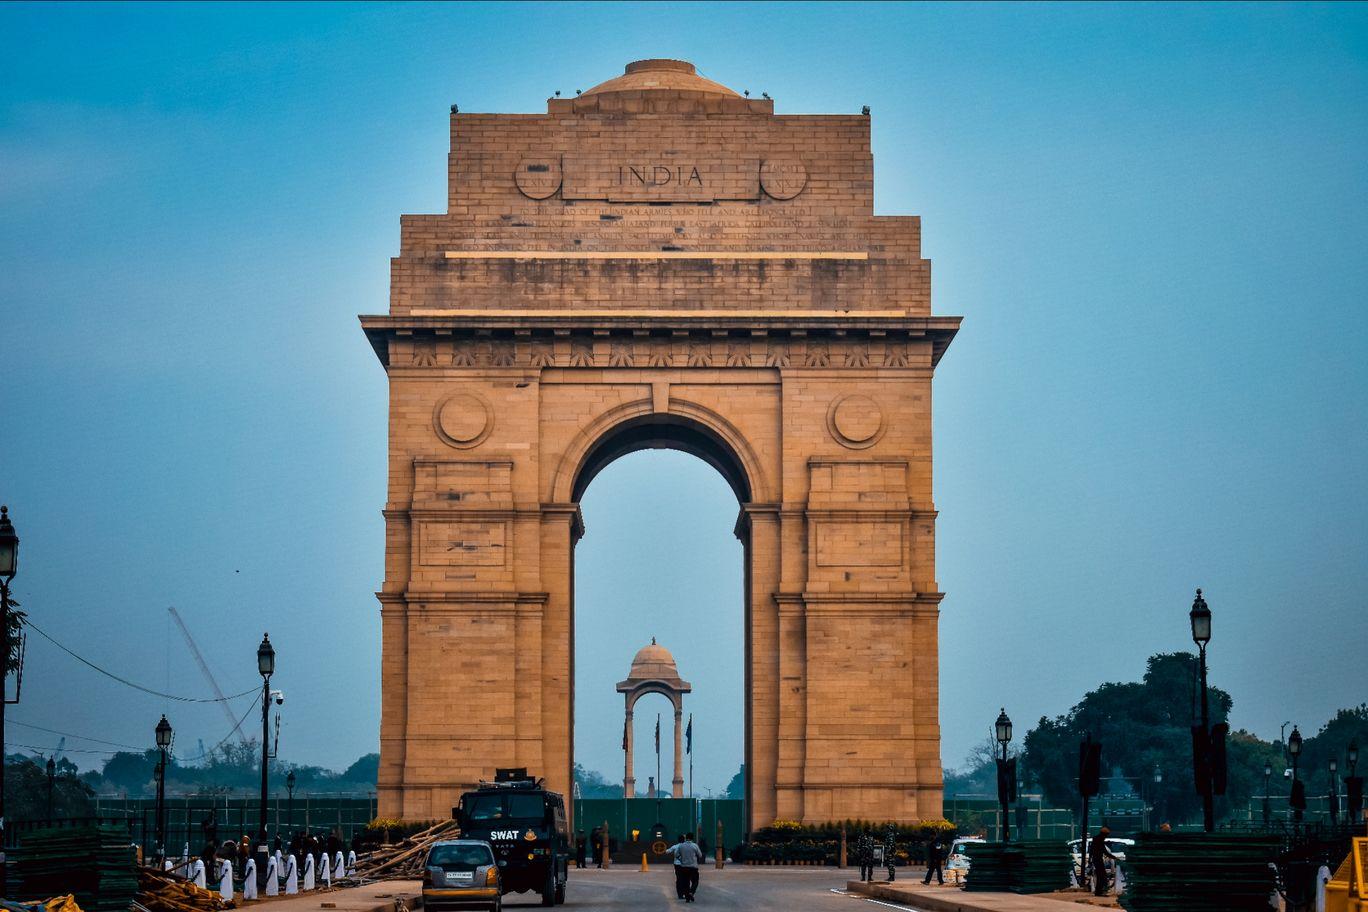 Photo of India Gate By Hari Krishnan